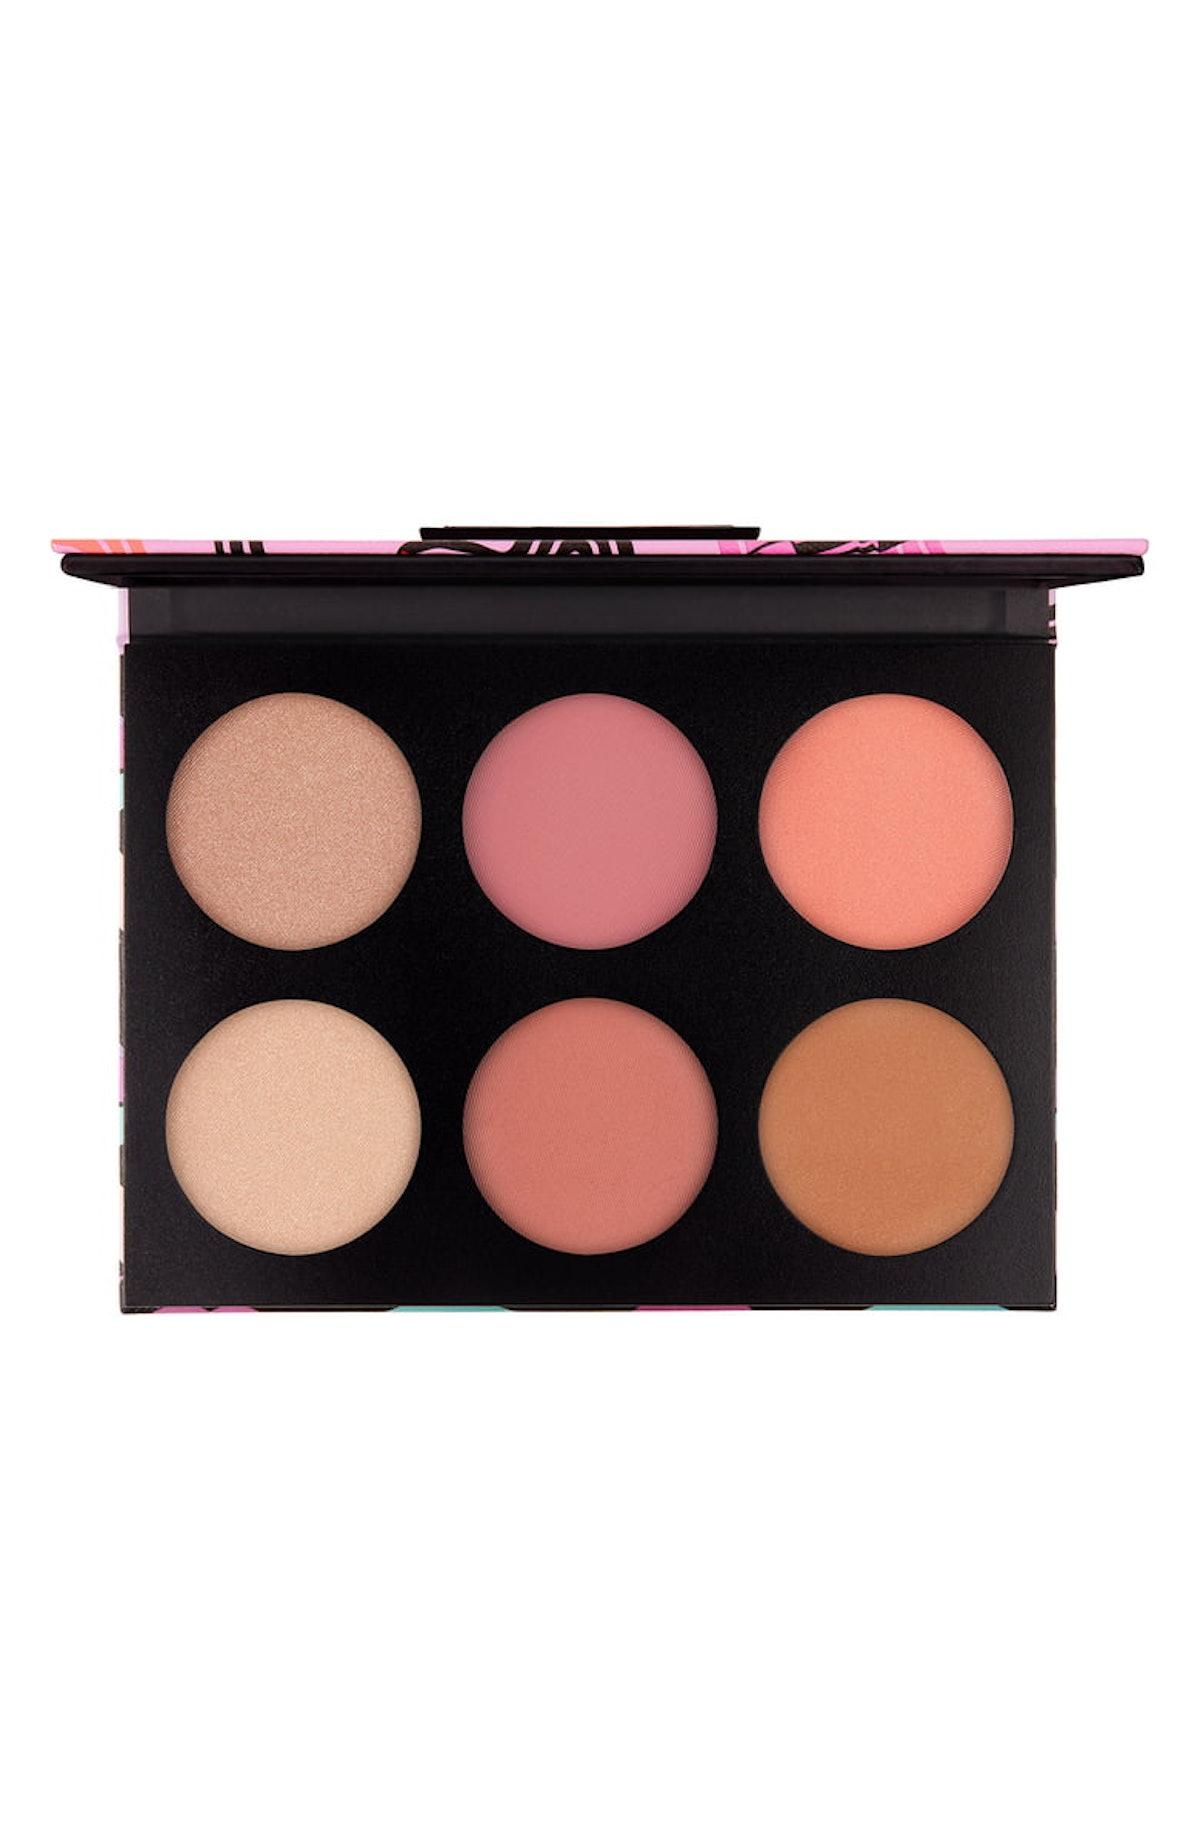 MAC Cosmetics All Star Face Palette